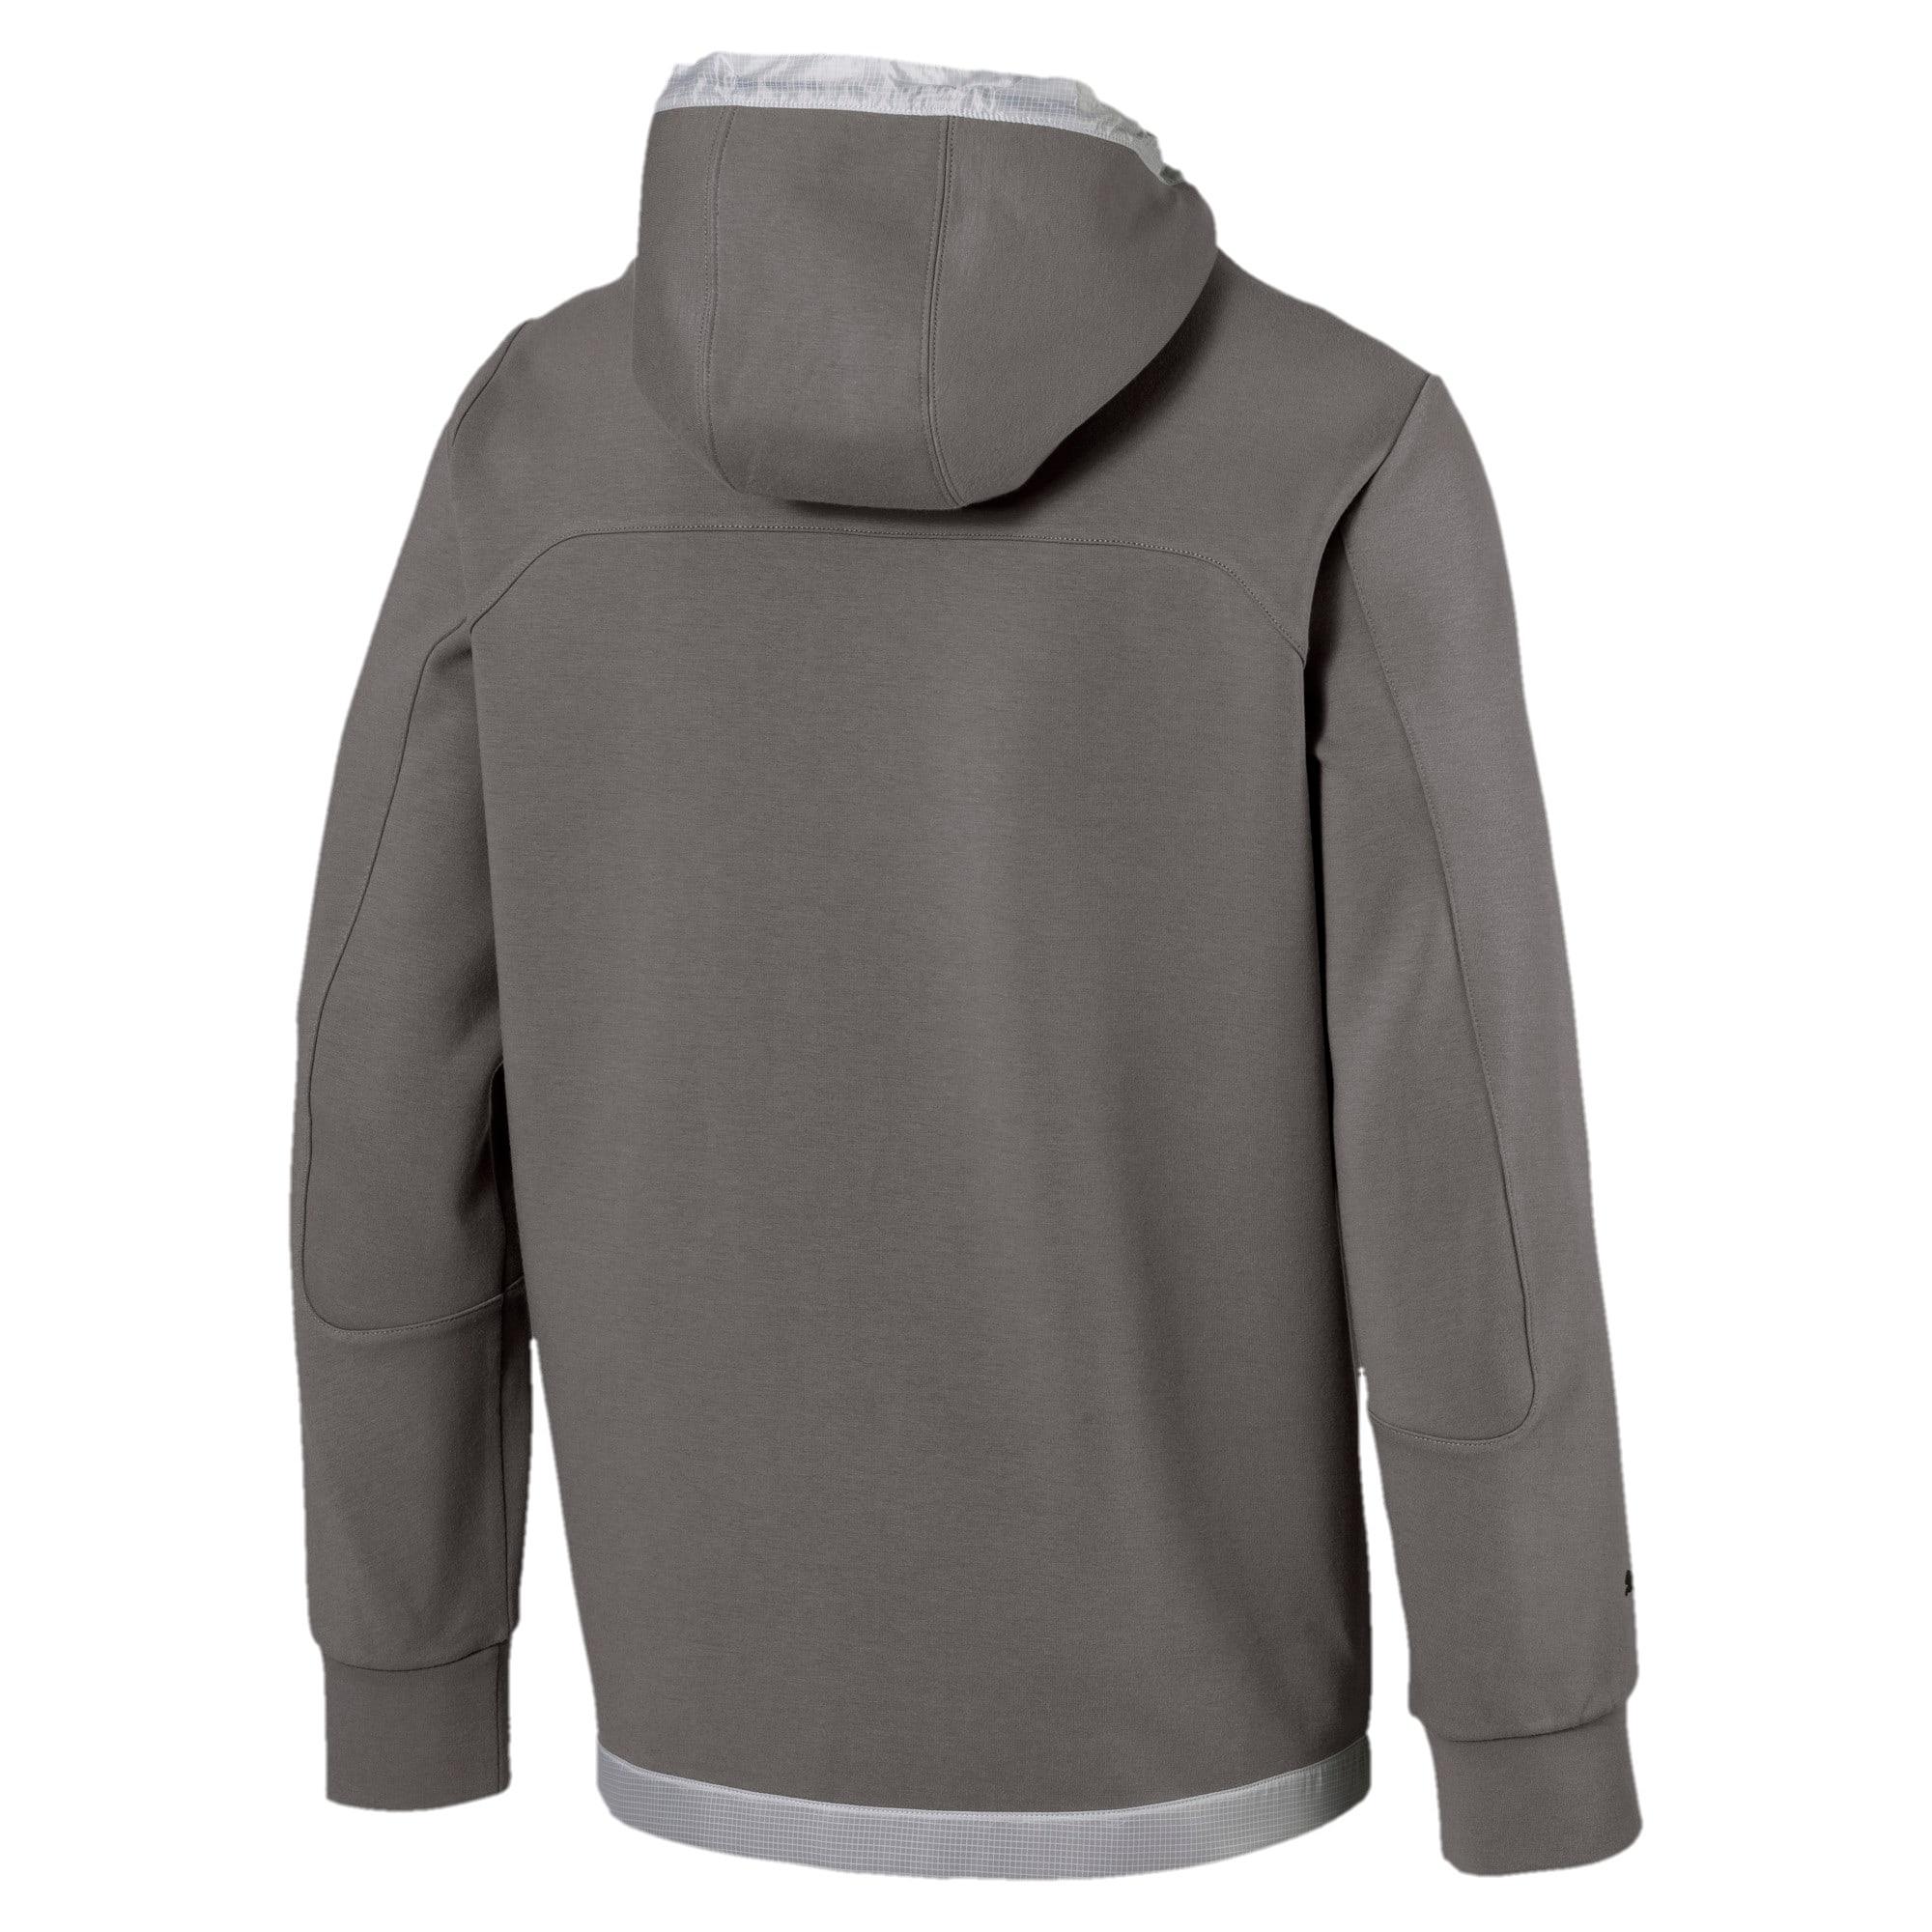 Thumbnail 2 of Scuderia Ferrari Men's Hooded Sweat Jacket, Charcoal Gray, medium